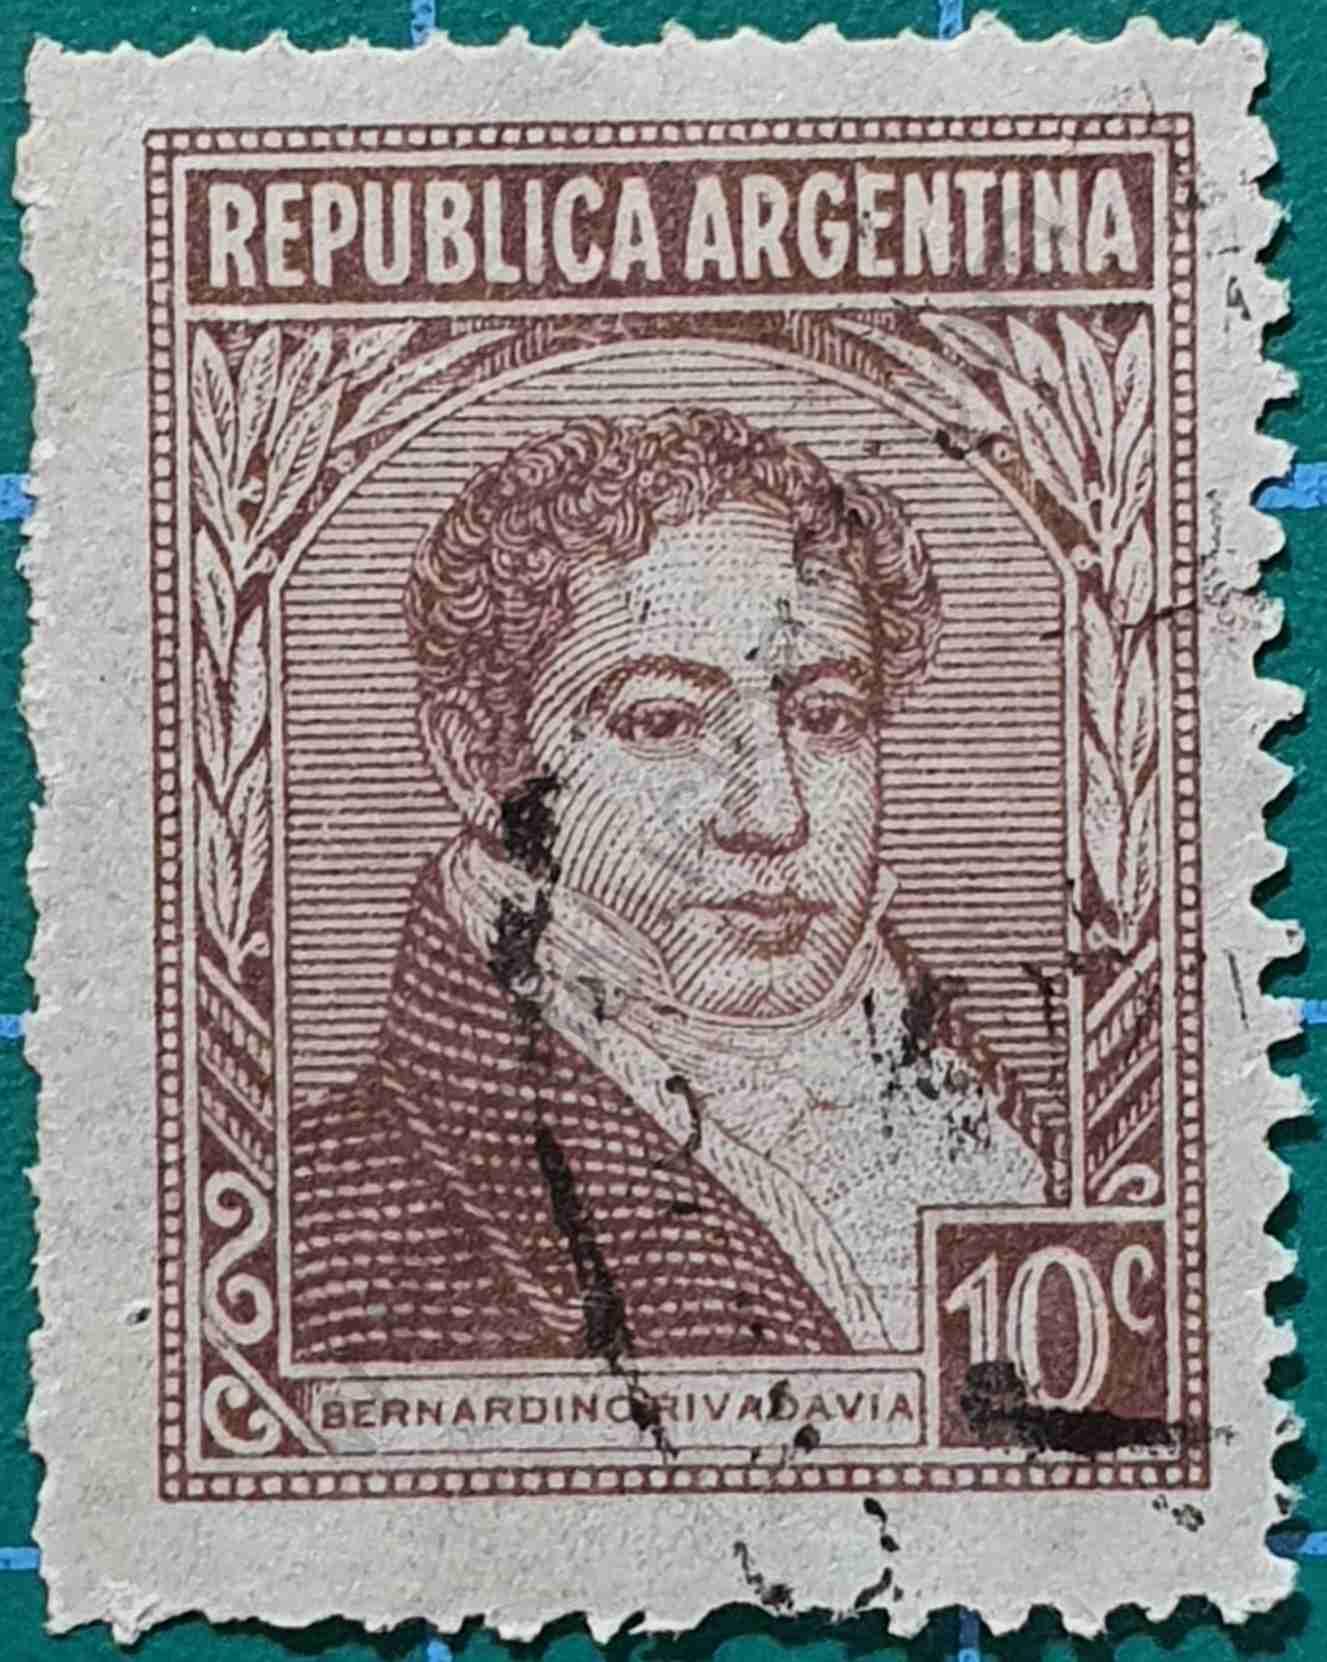 Bernardino Rivadavia - Sello Argentina 1949